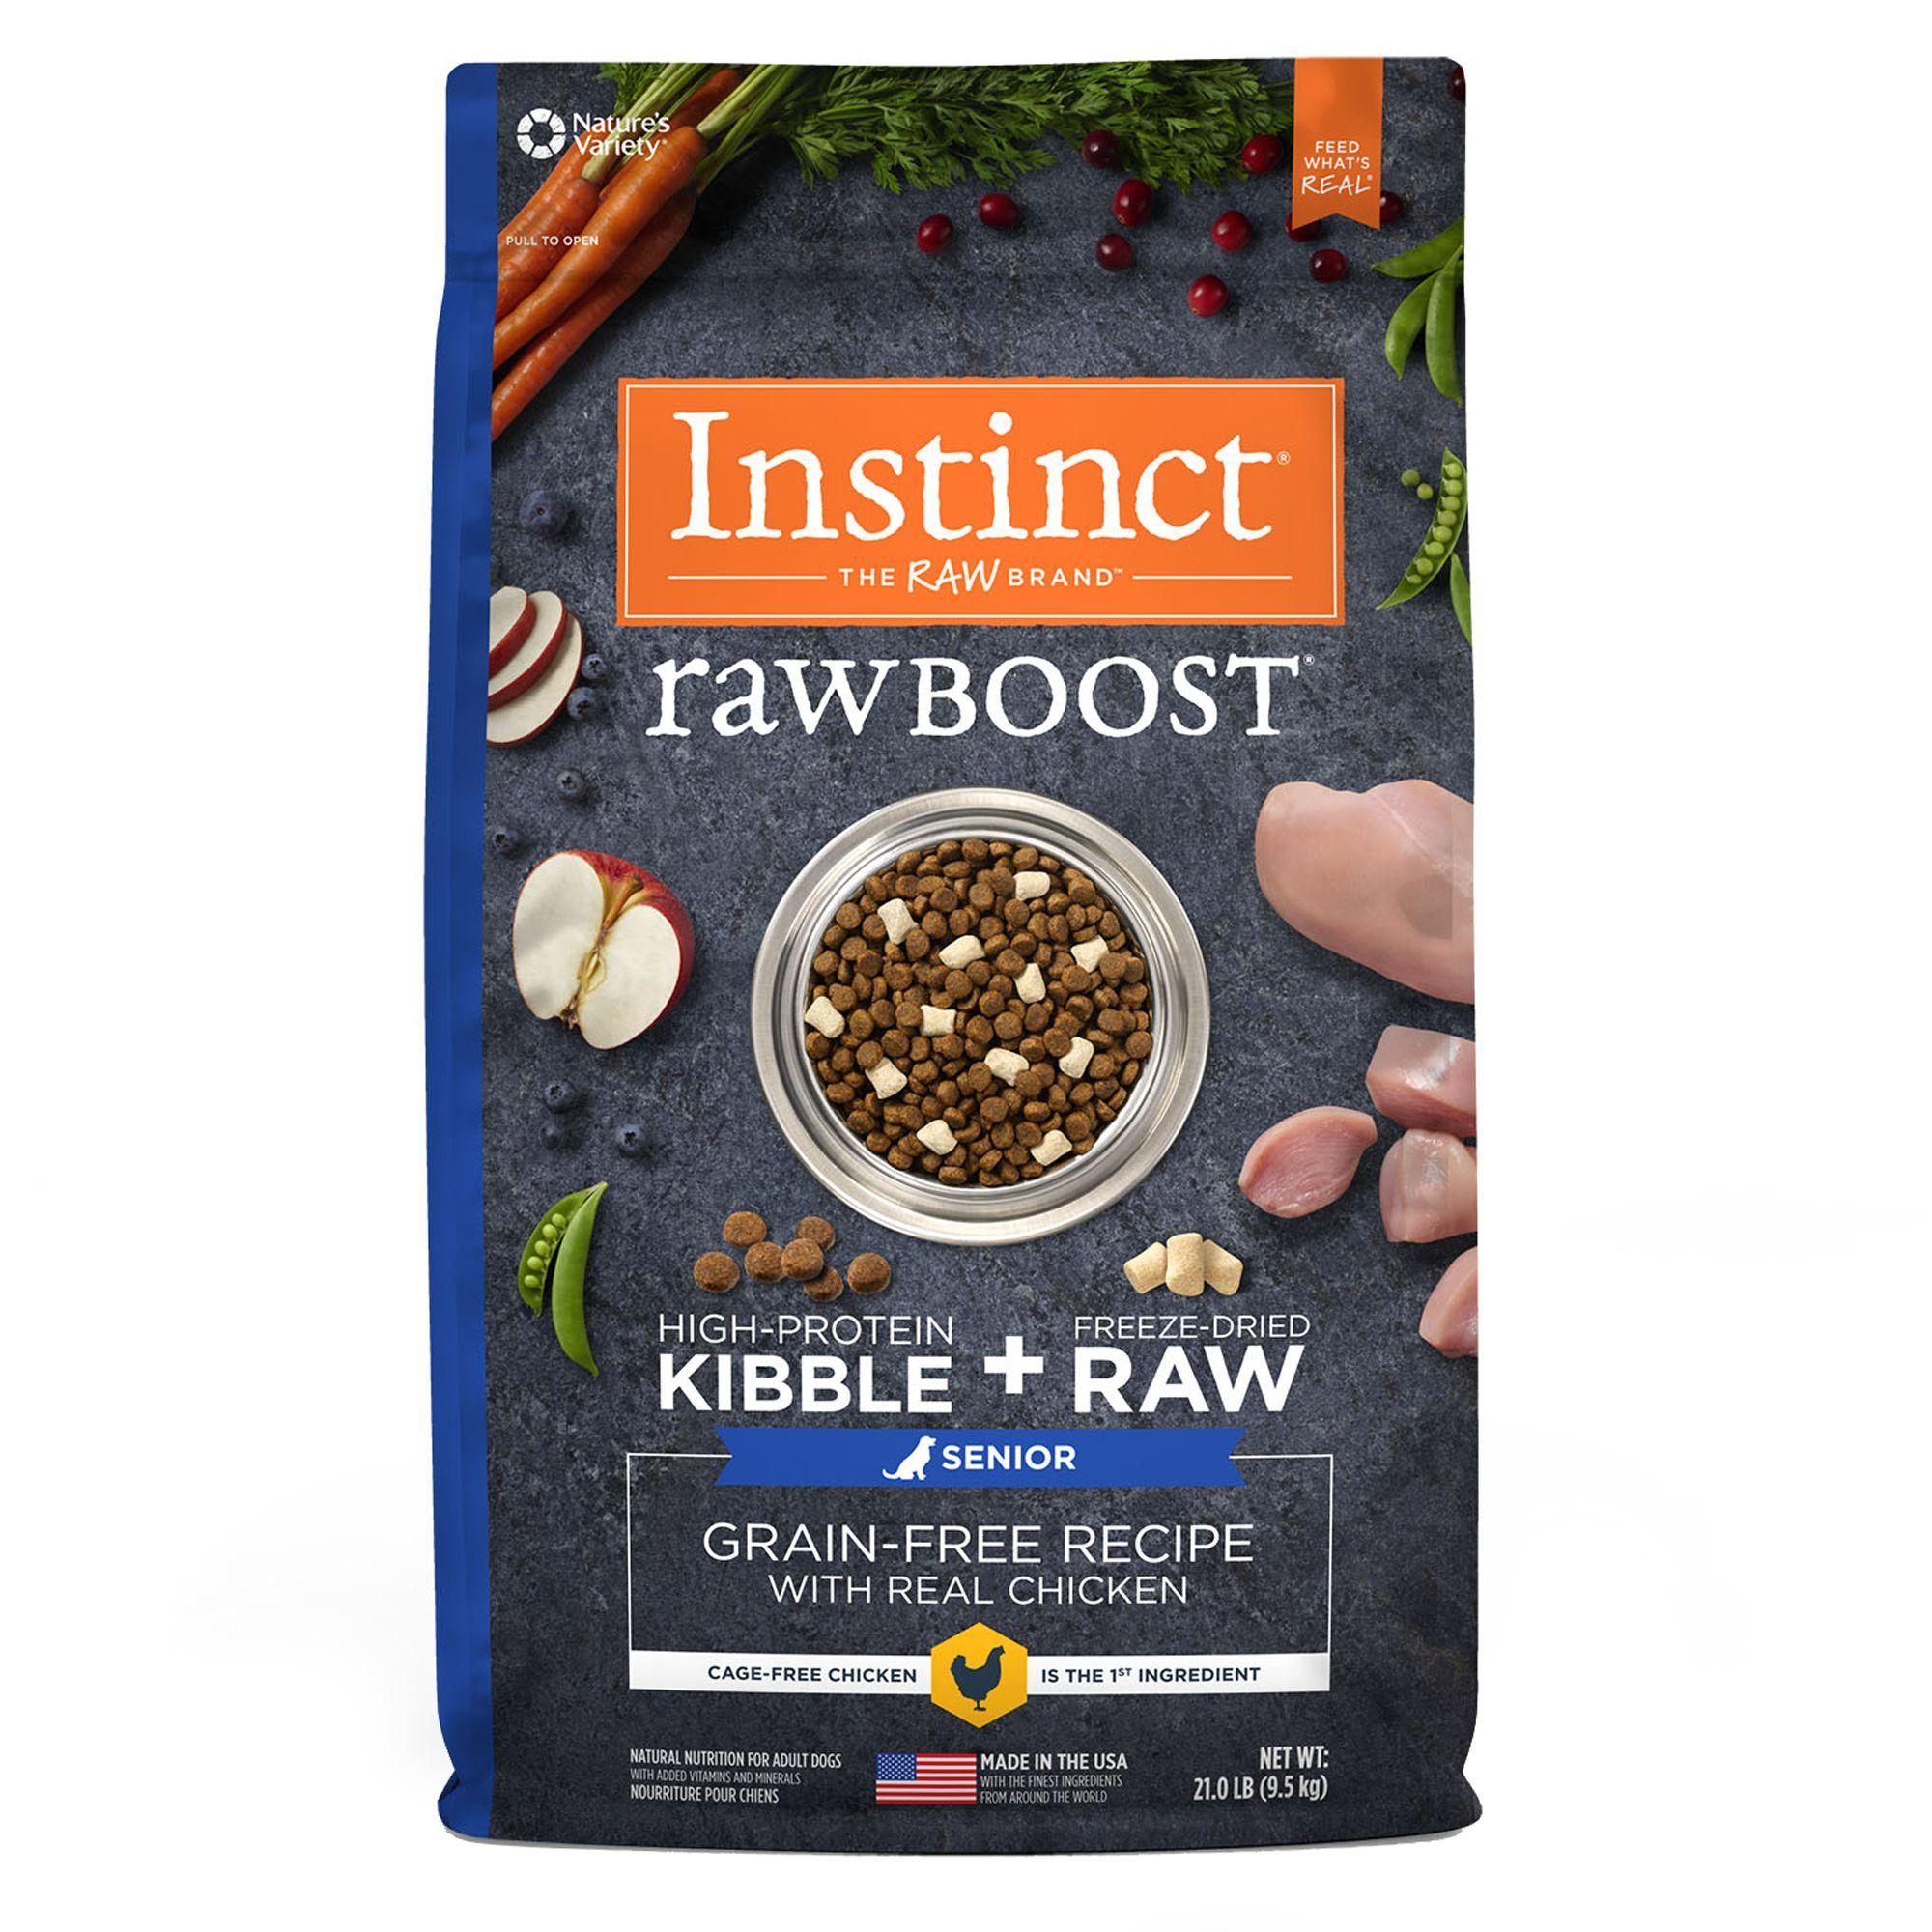 Natures variety instinct raw boost senior dog food